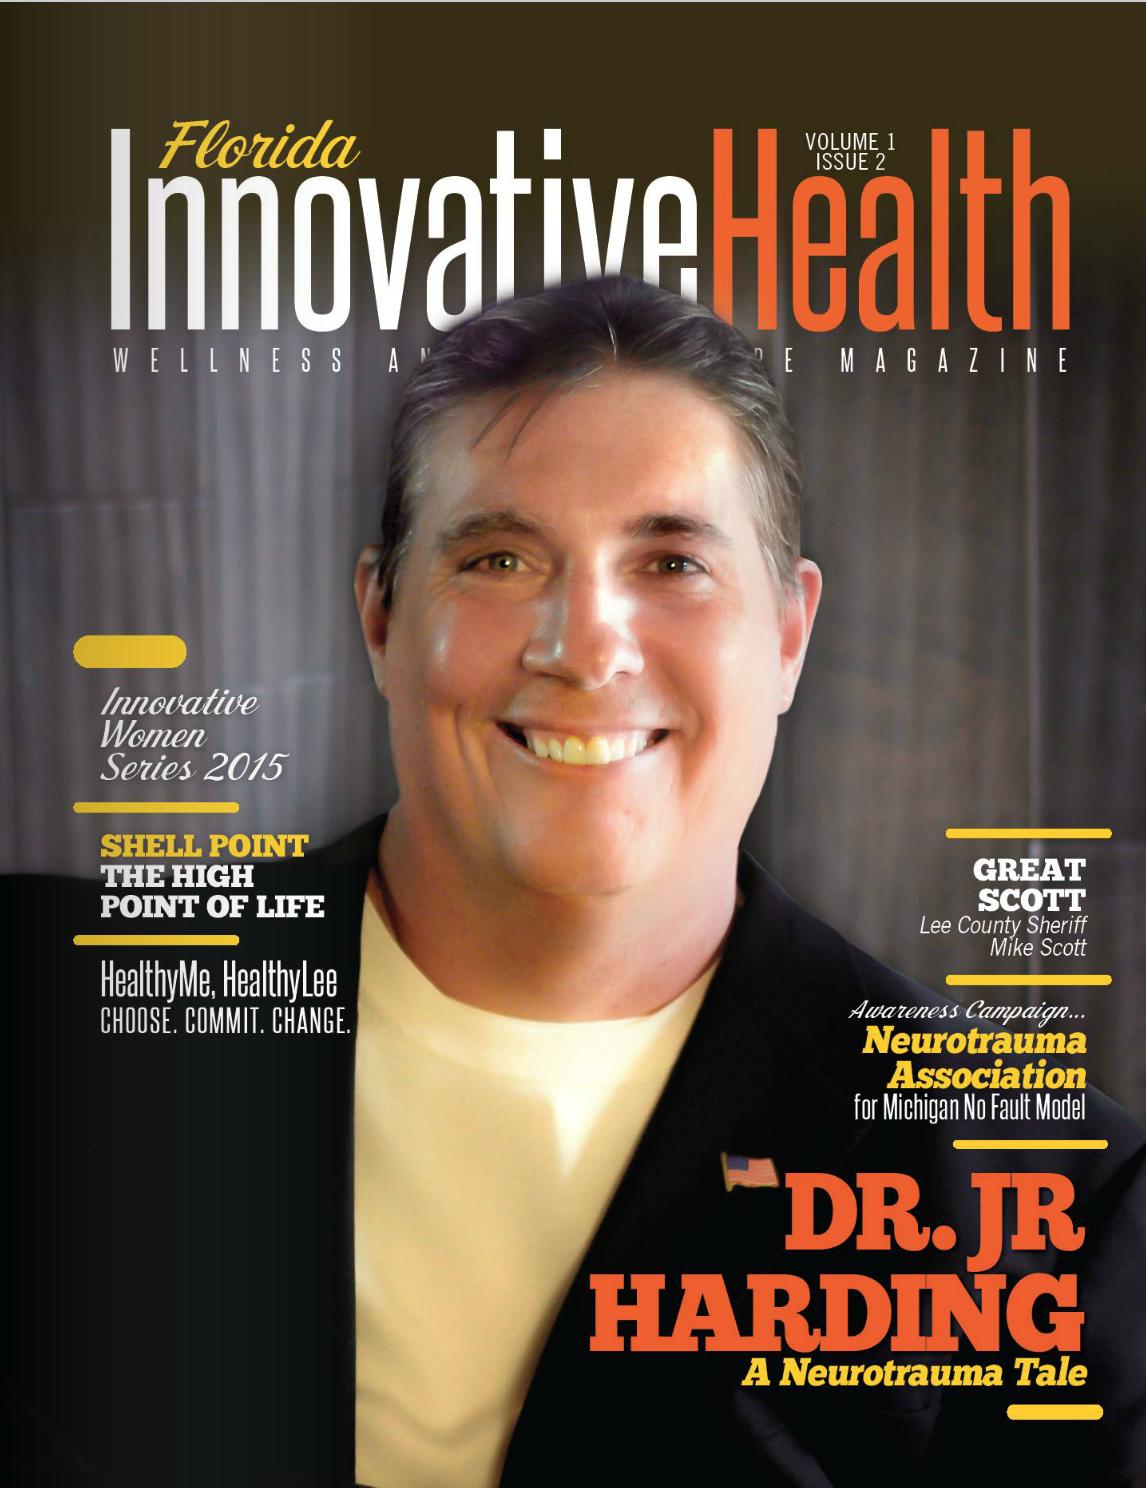 JR Harding FL Innovative Health cover